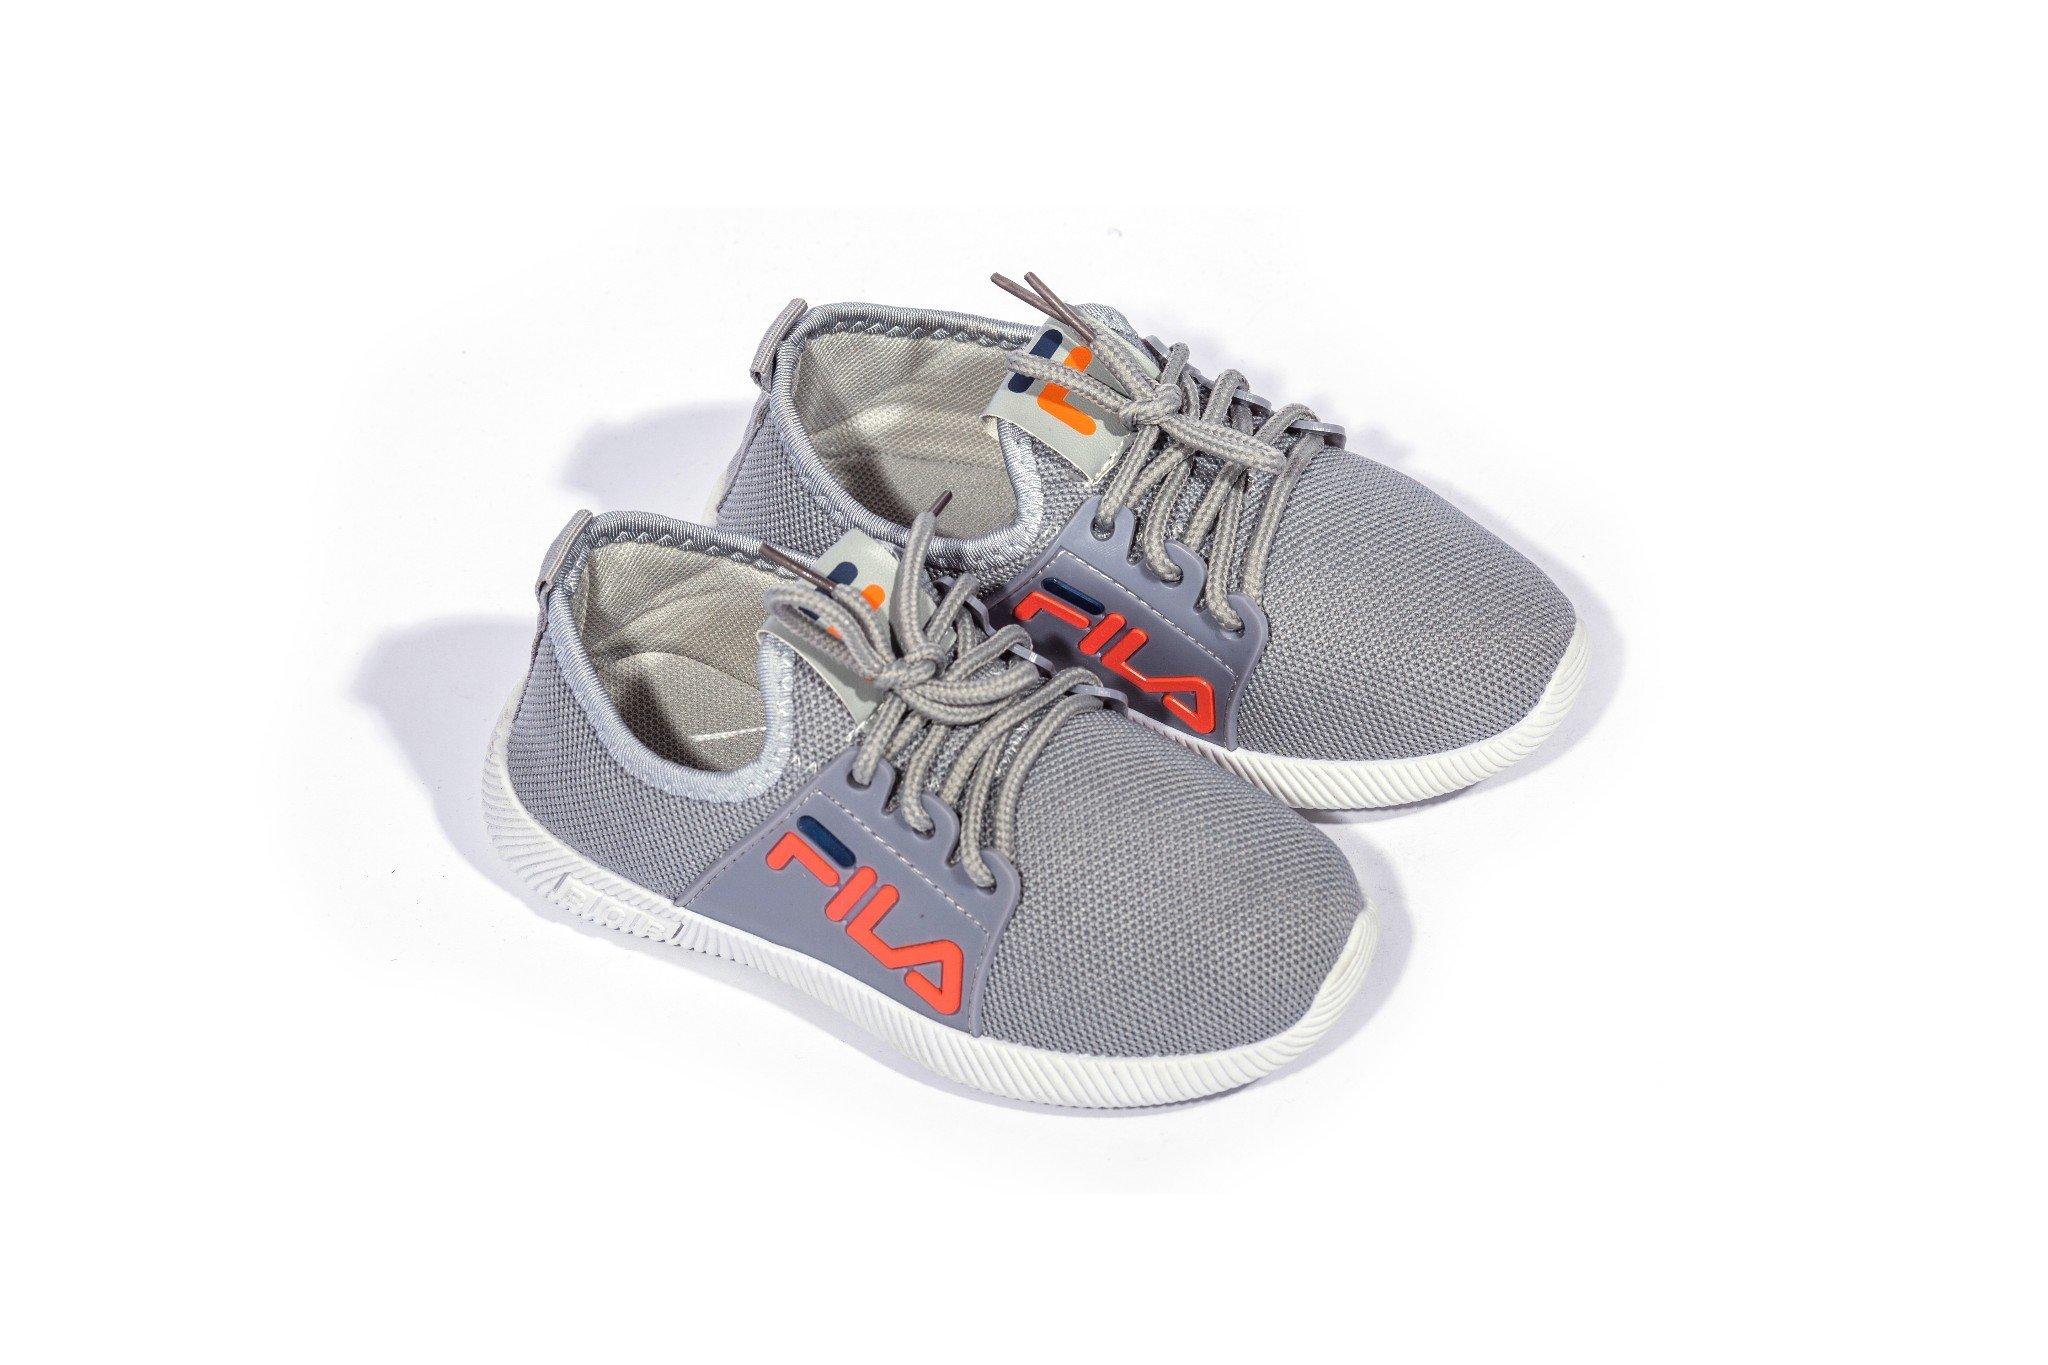 Giày sneaker Fila mã GN00014